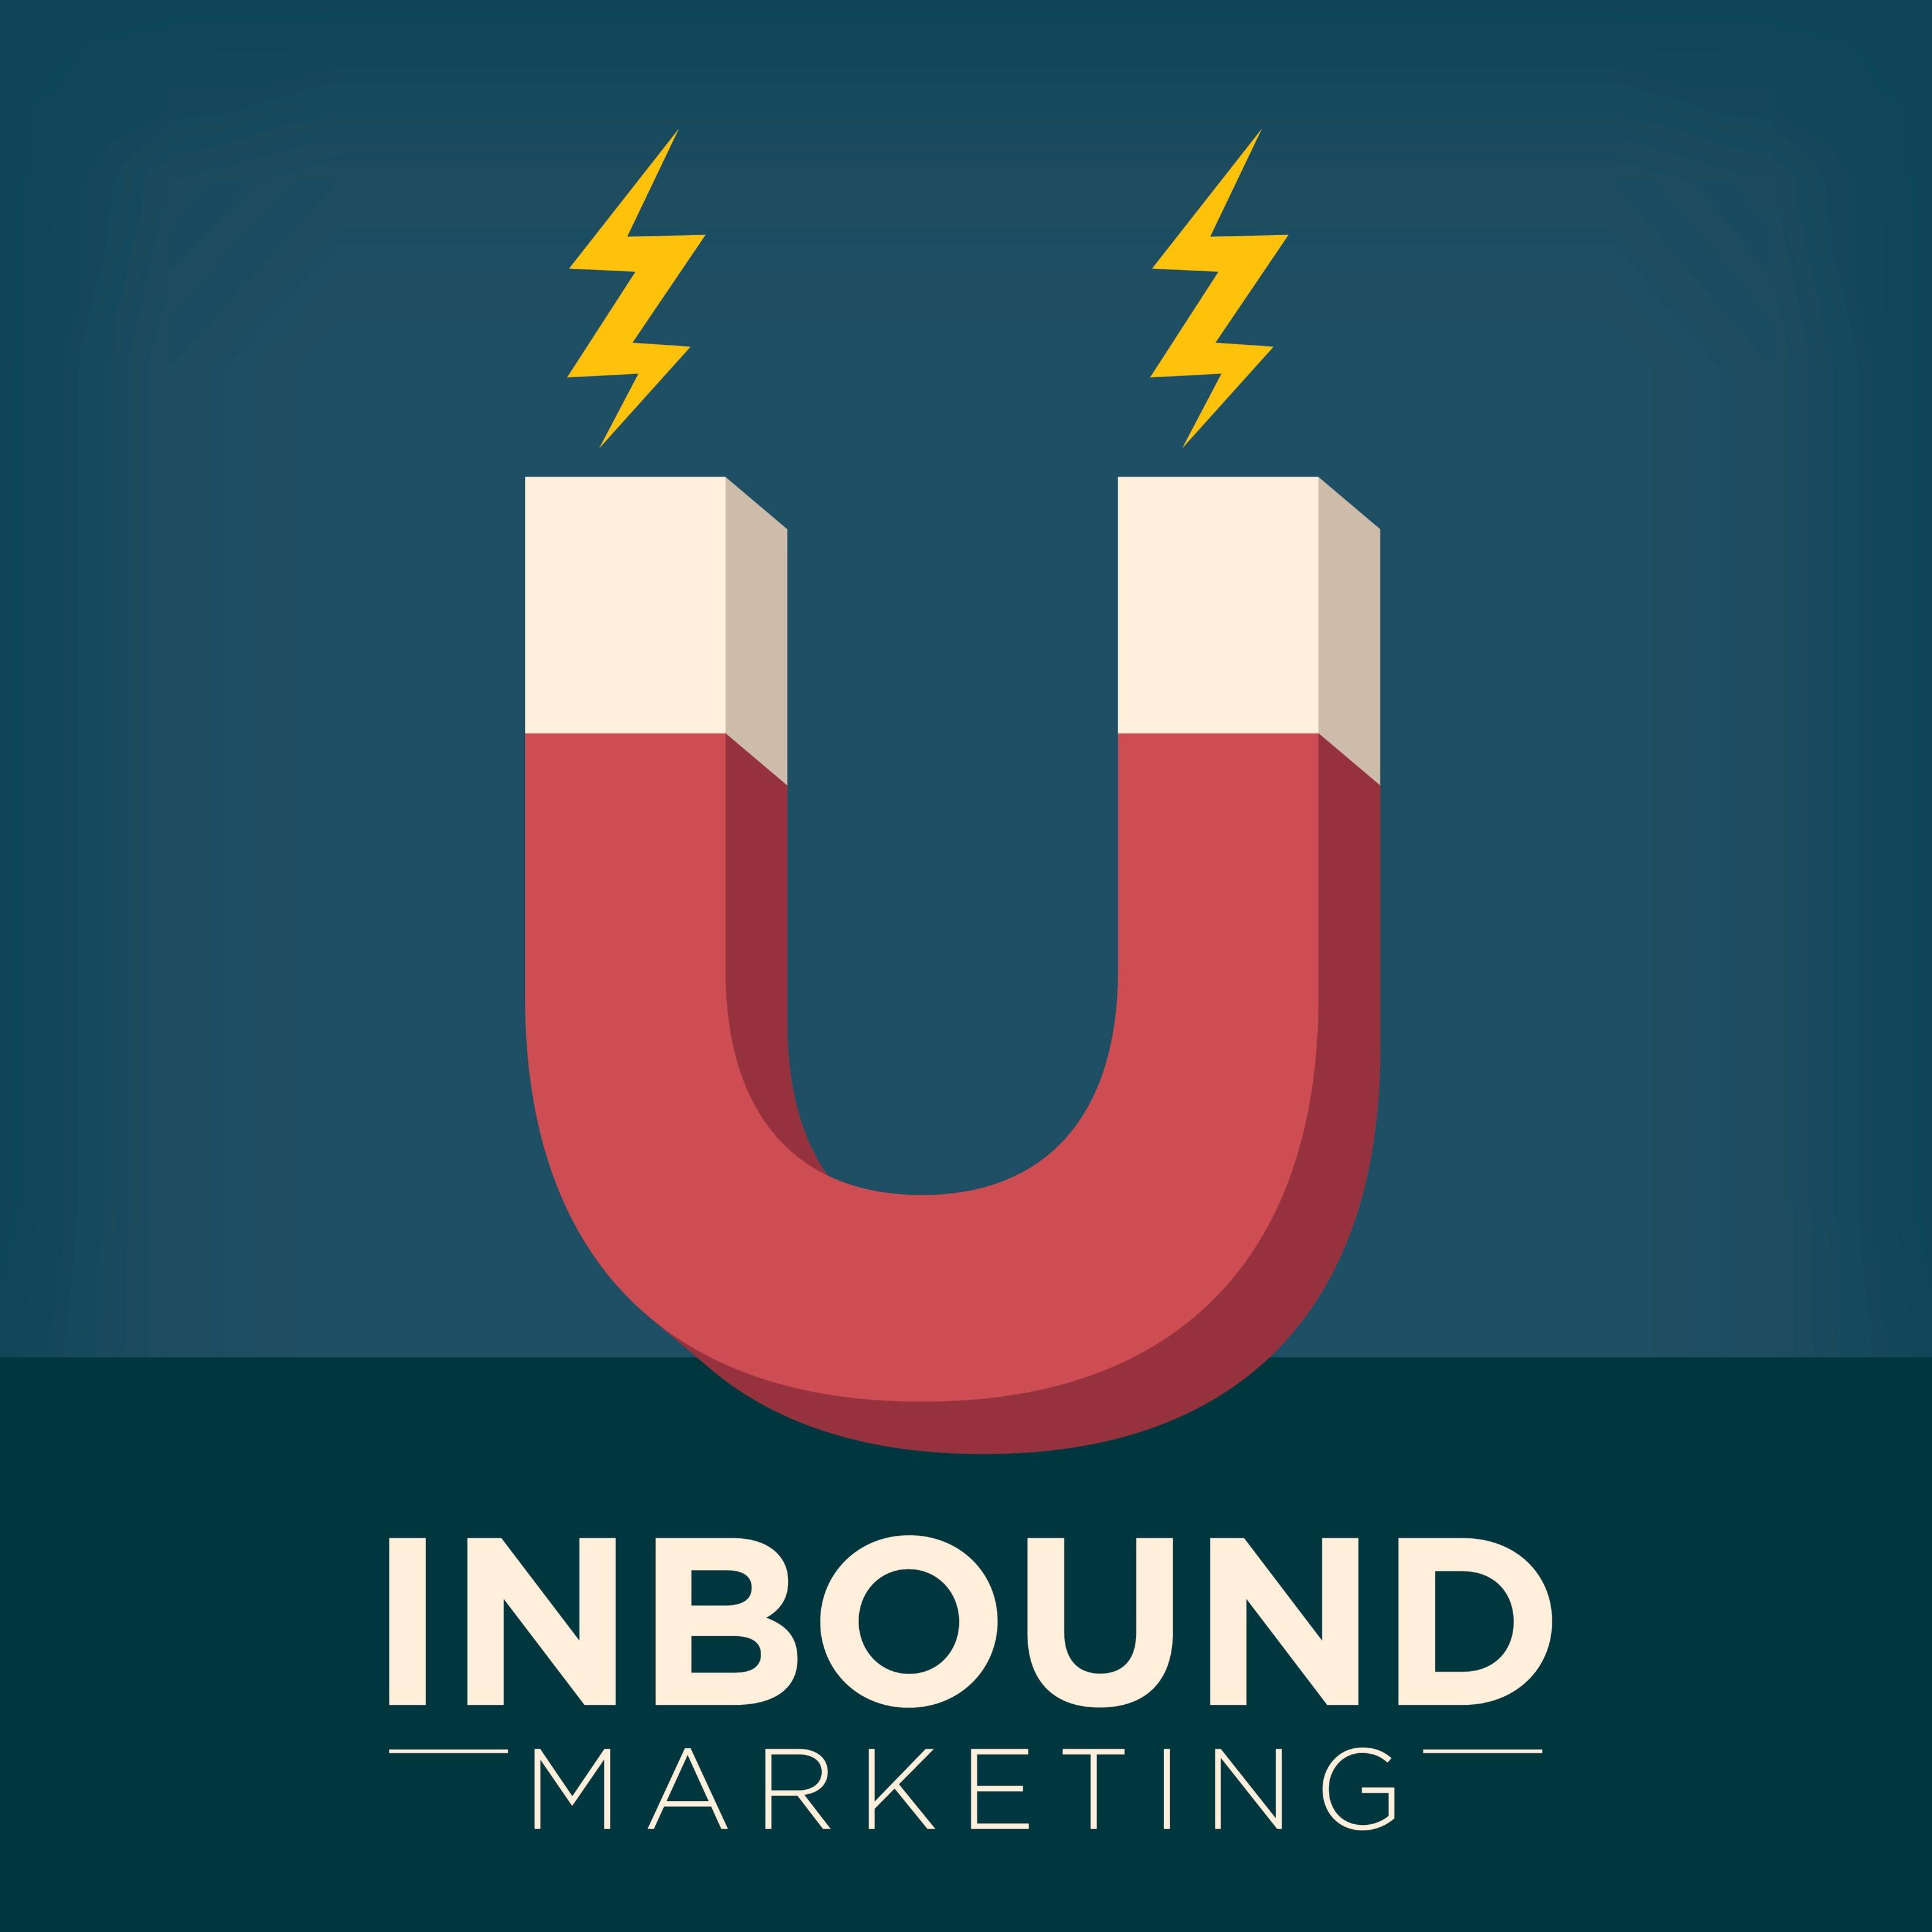 ¿Necesito una herramienta para hacer Inbound Marketing?